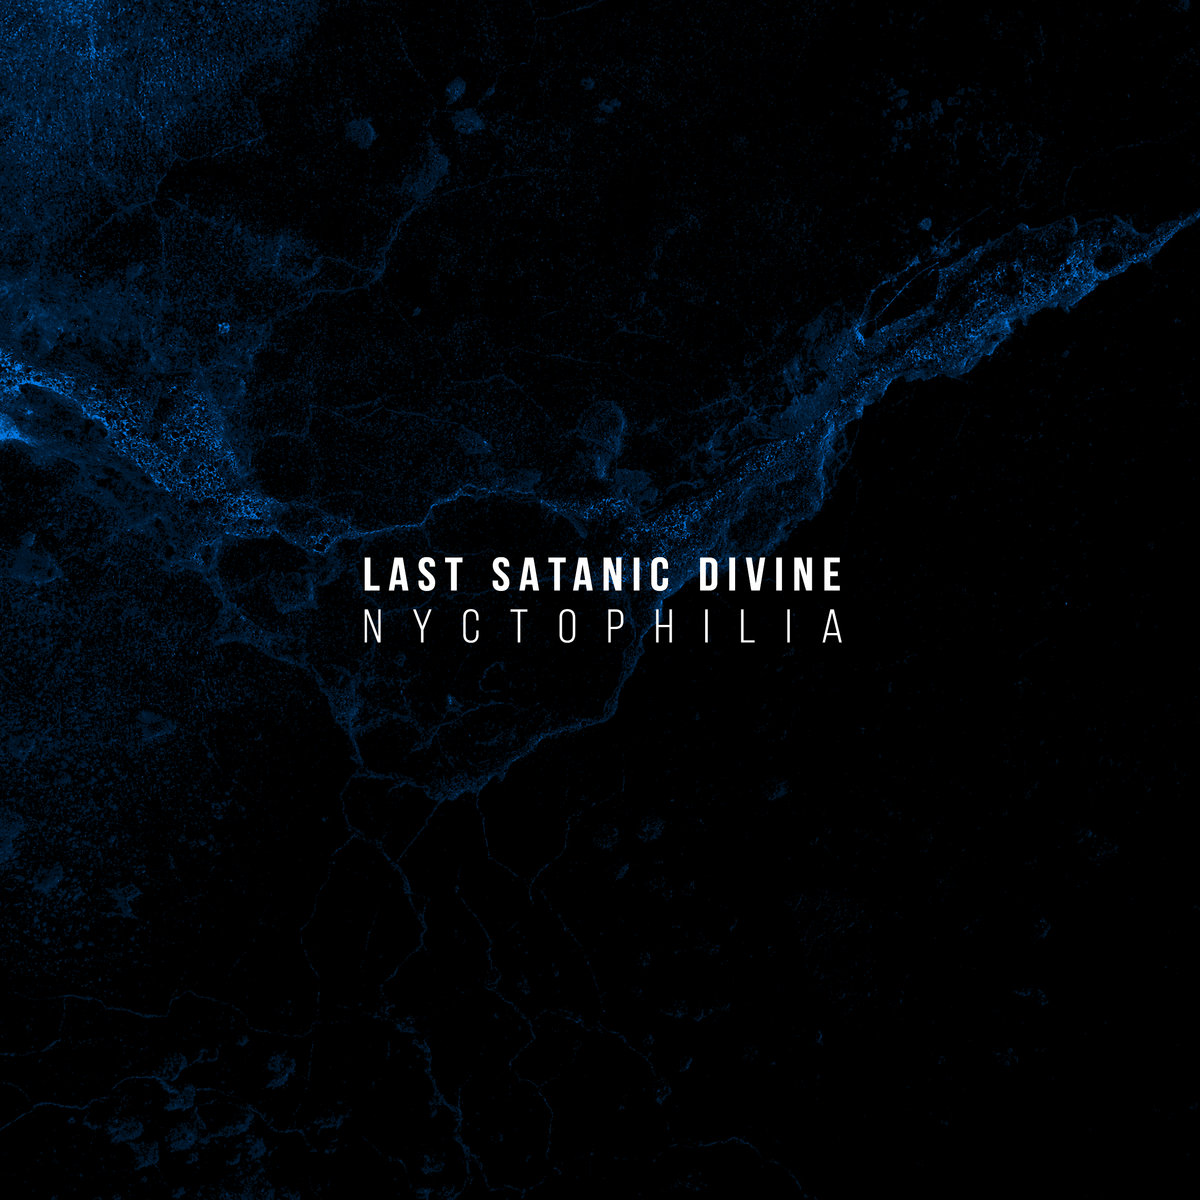 Nyctophilia Last Satanic Divine